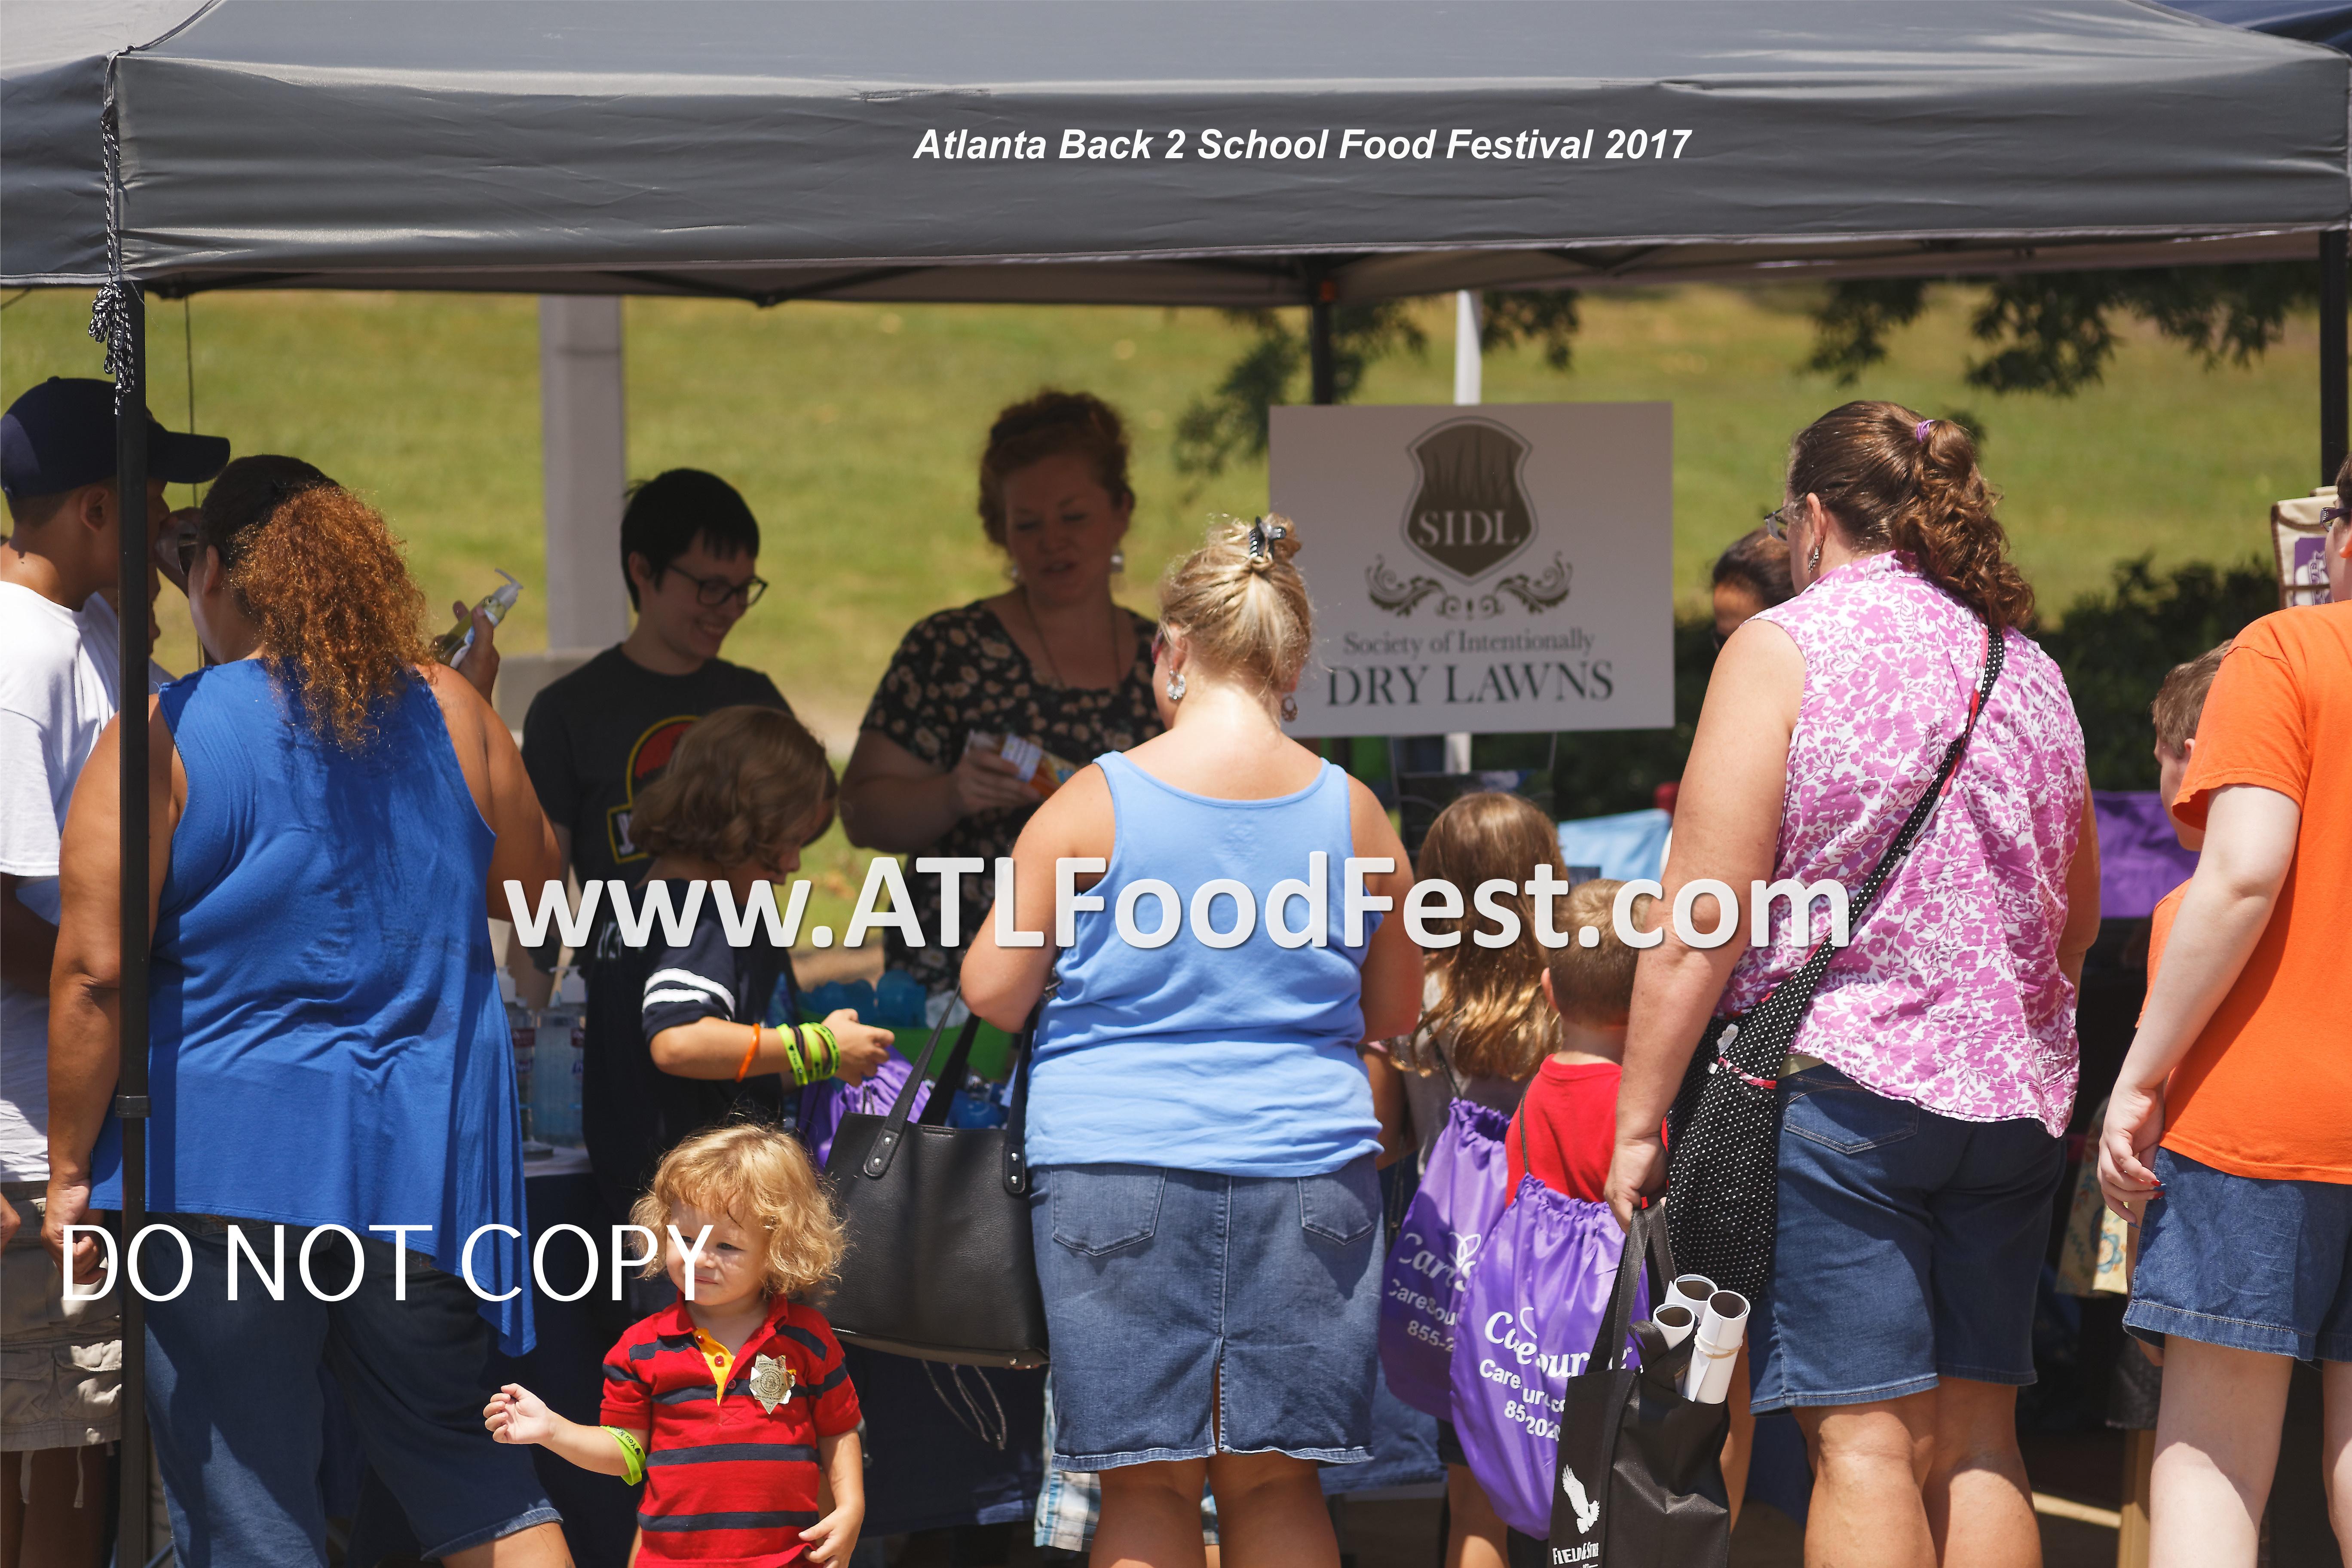 Atlfoodfest Vendors